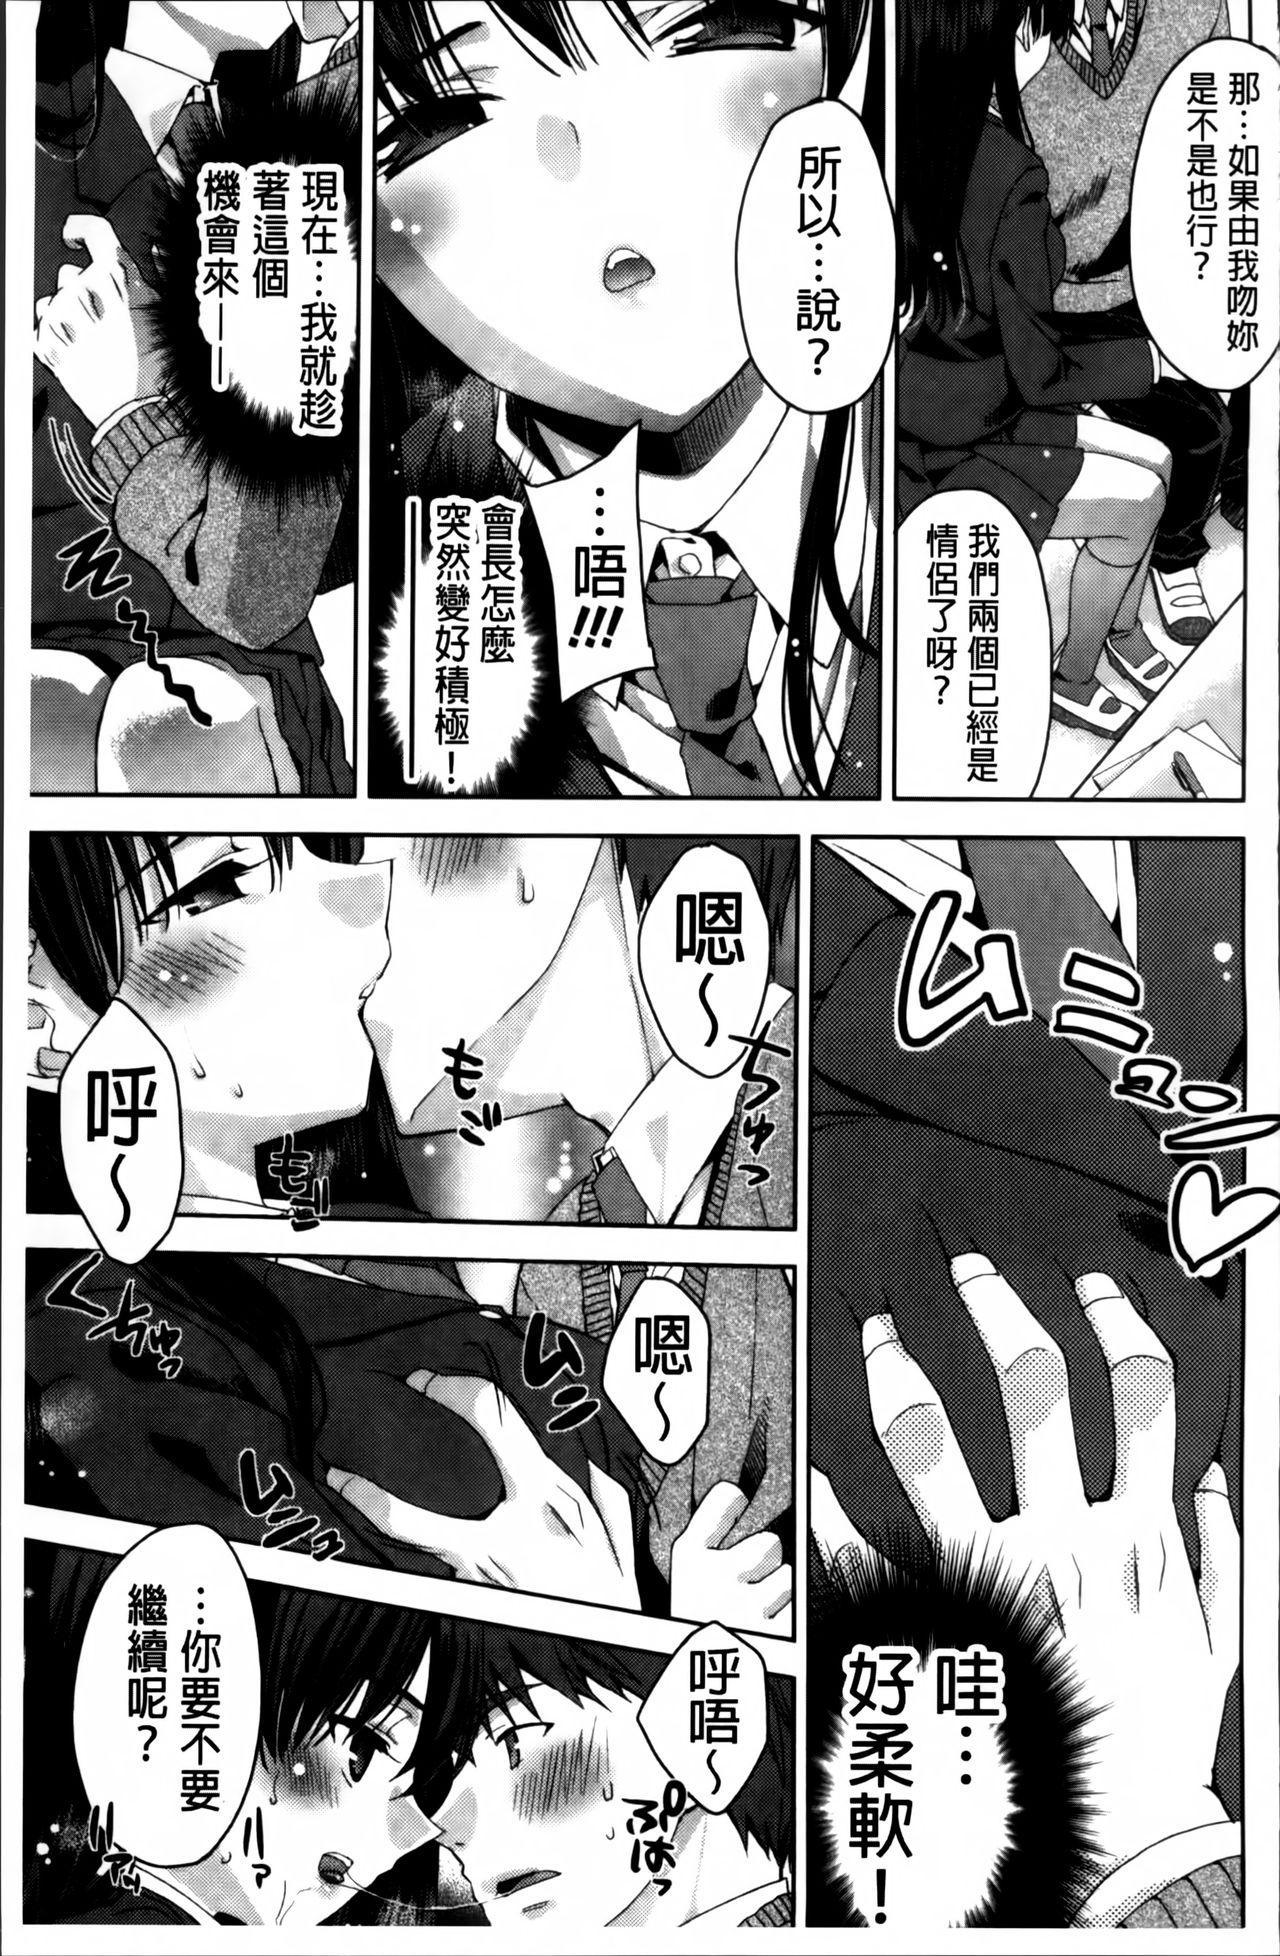 Kisstomo 78